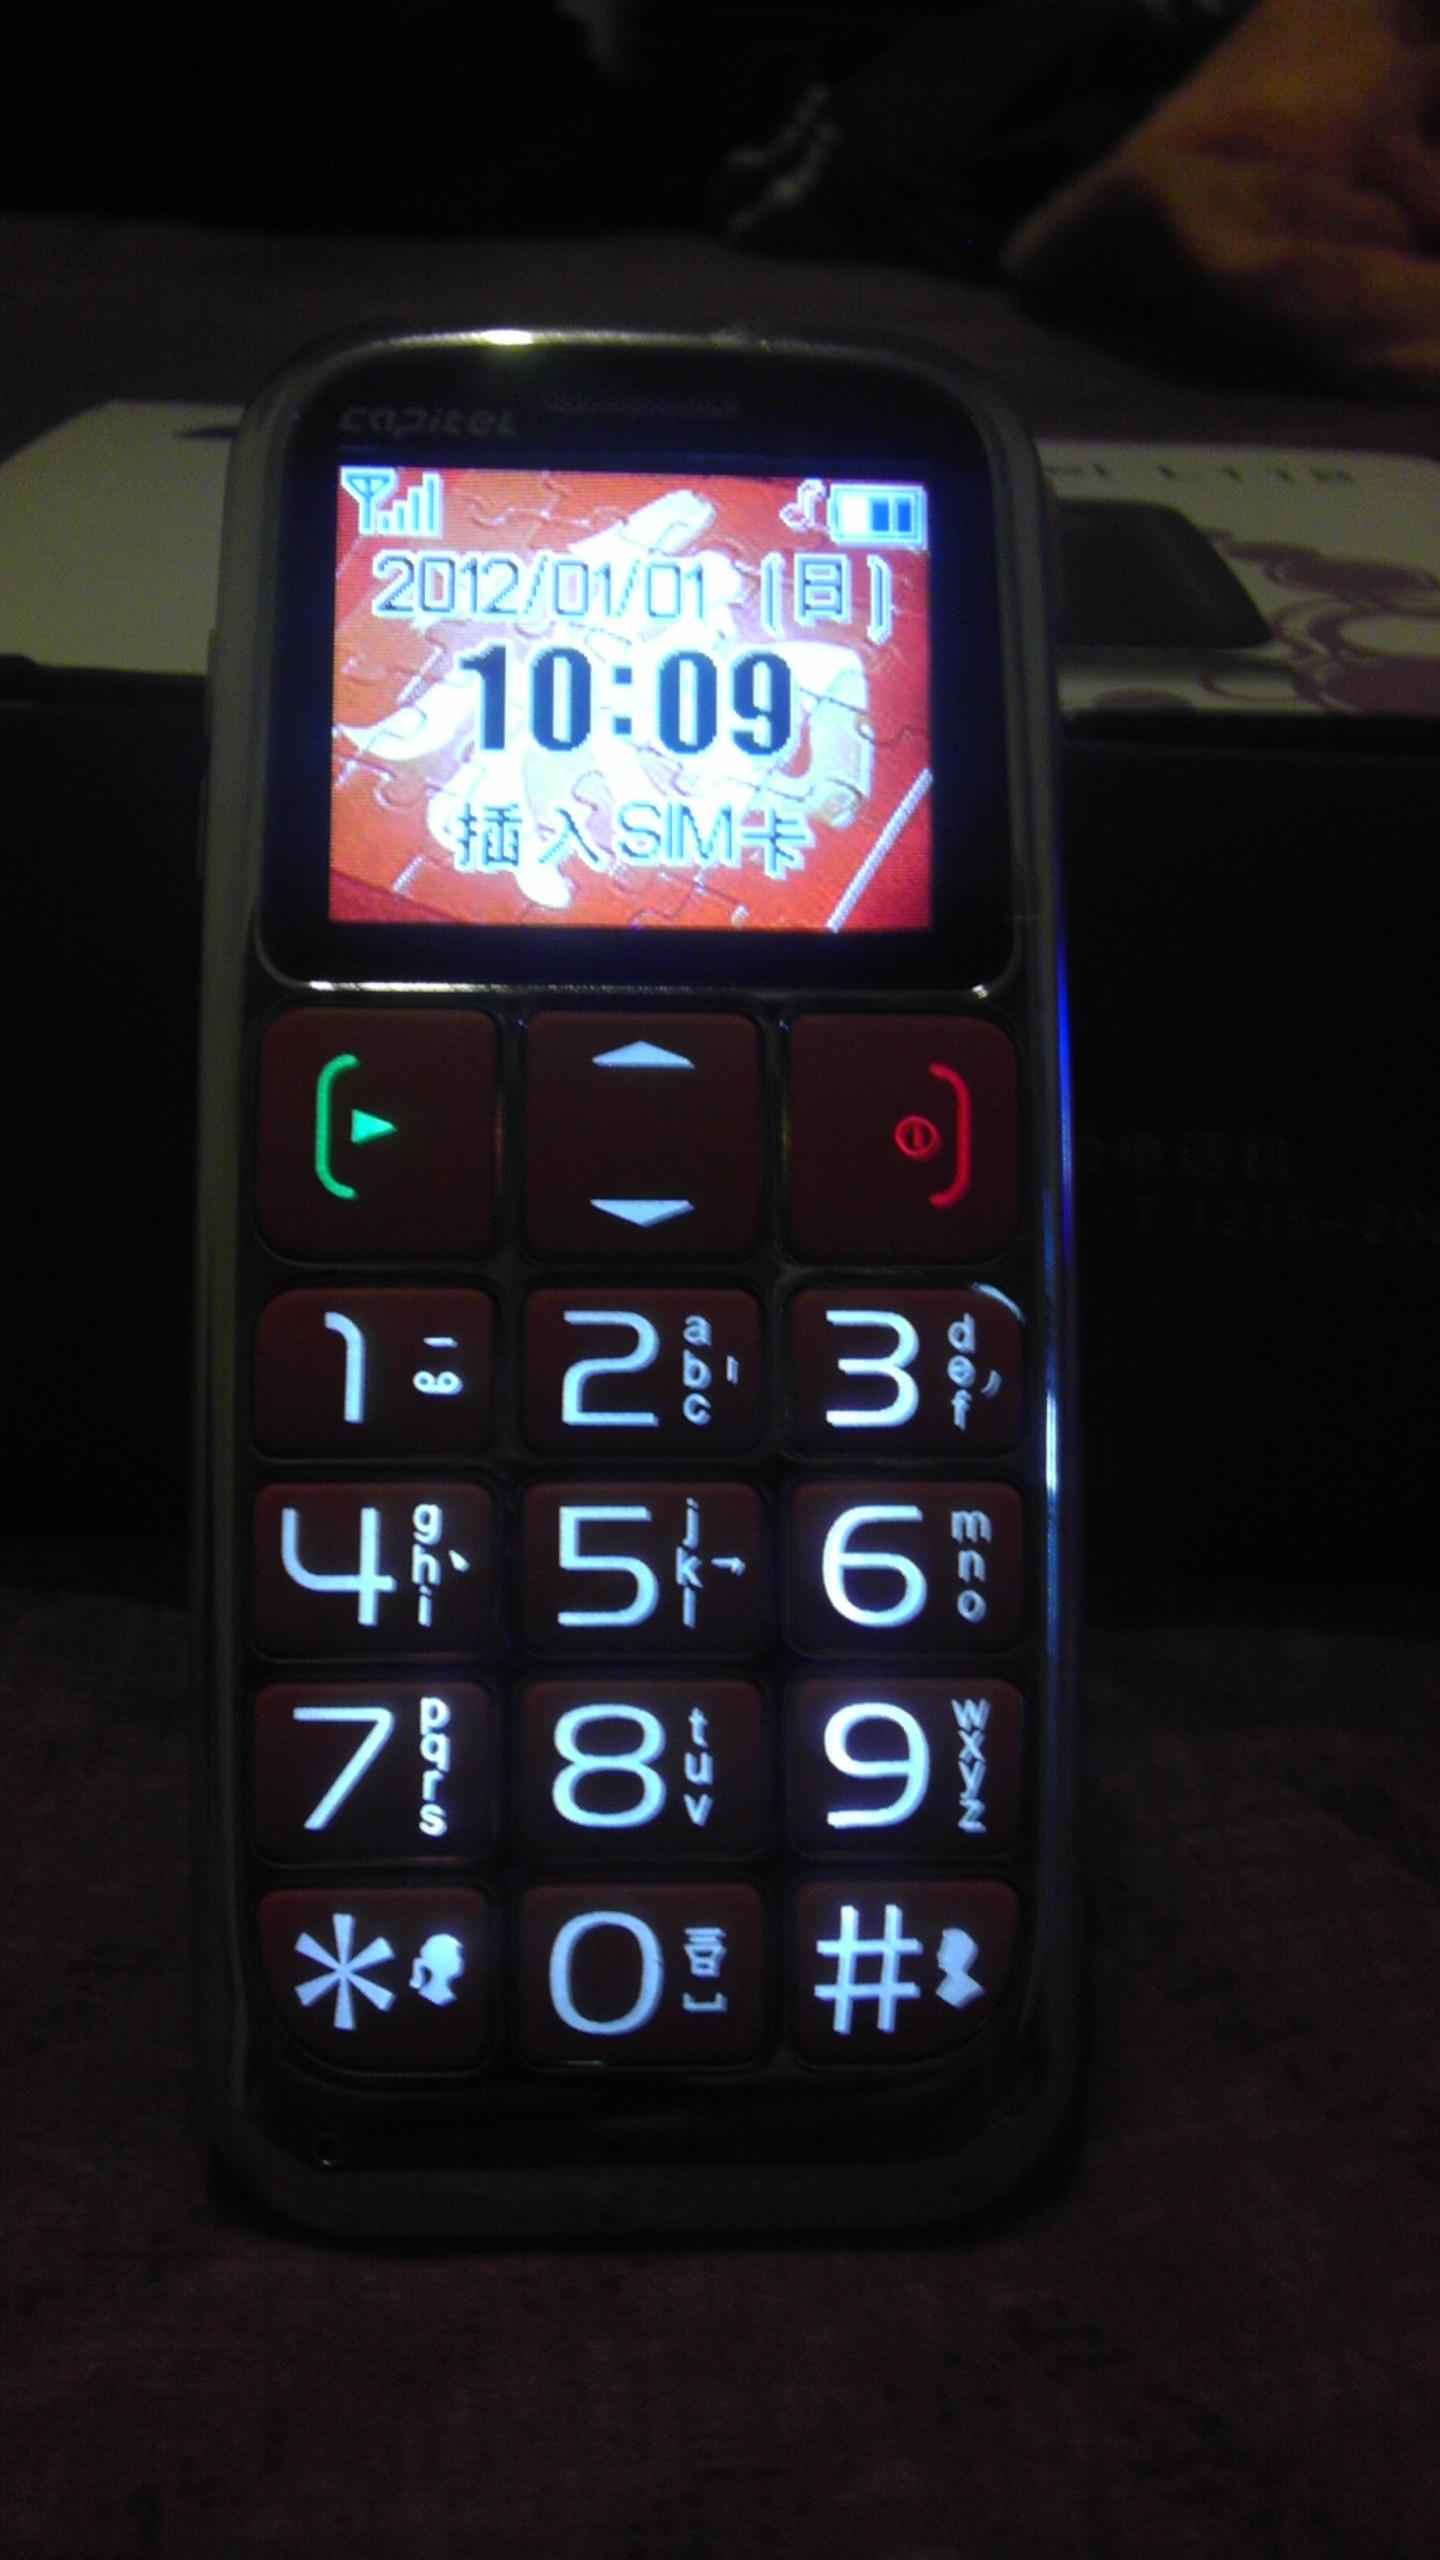 jordan 11 for sale philippines 00258418 online